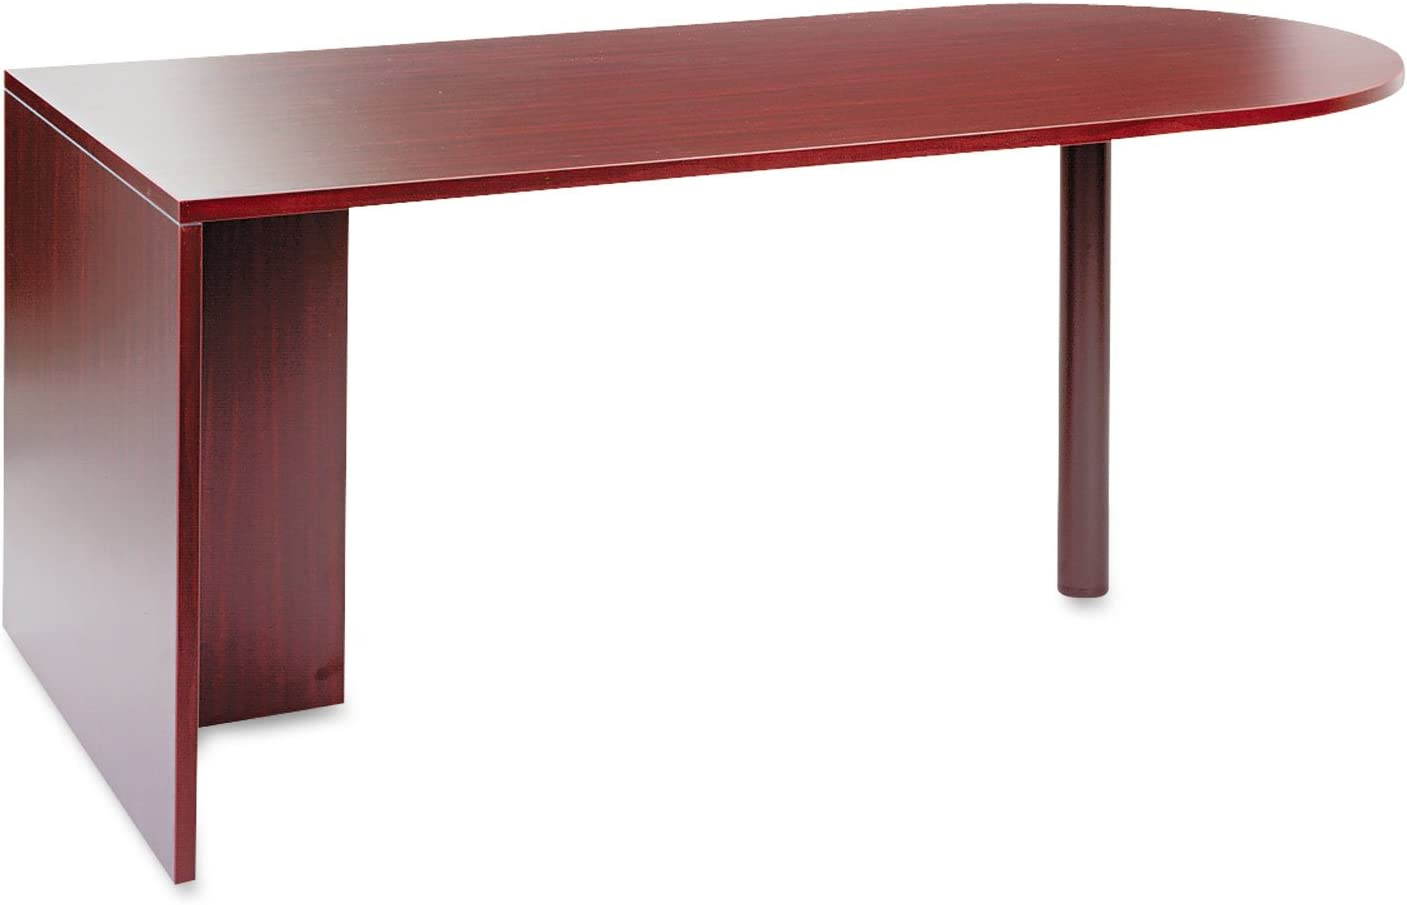 Alera VA277236MY Surprise price Valencia Series D Top Desk 1 29 X 2d 71w 35 Max 81% OFF